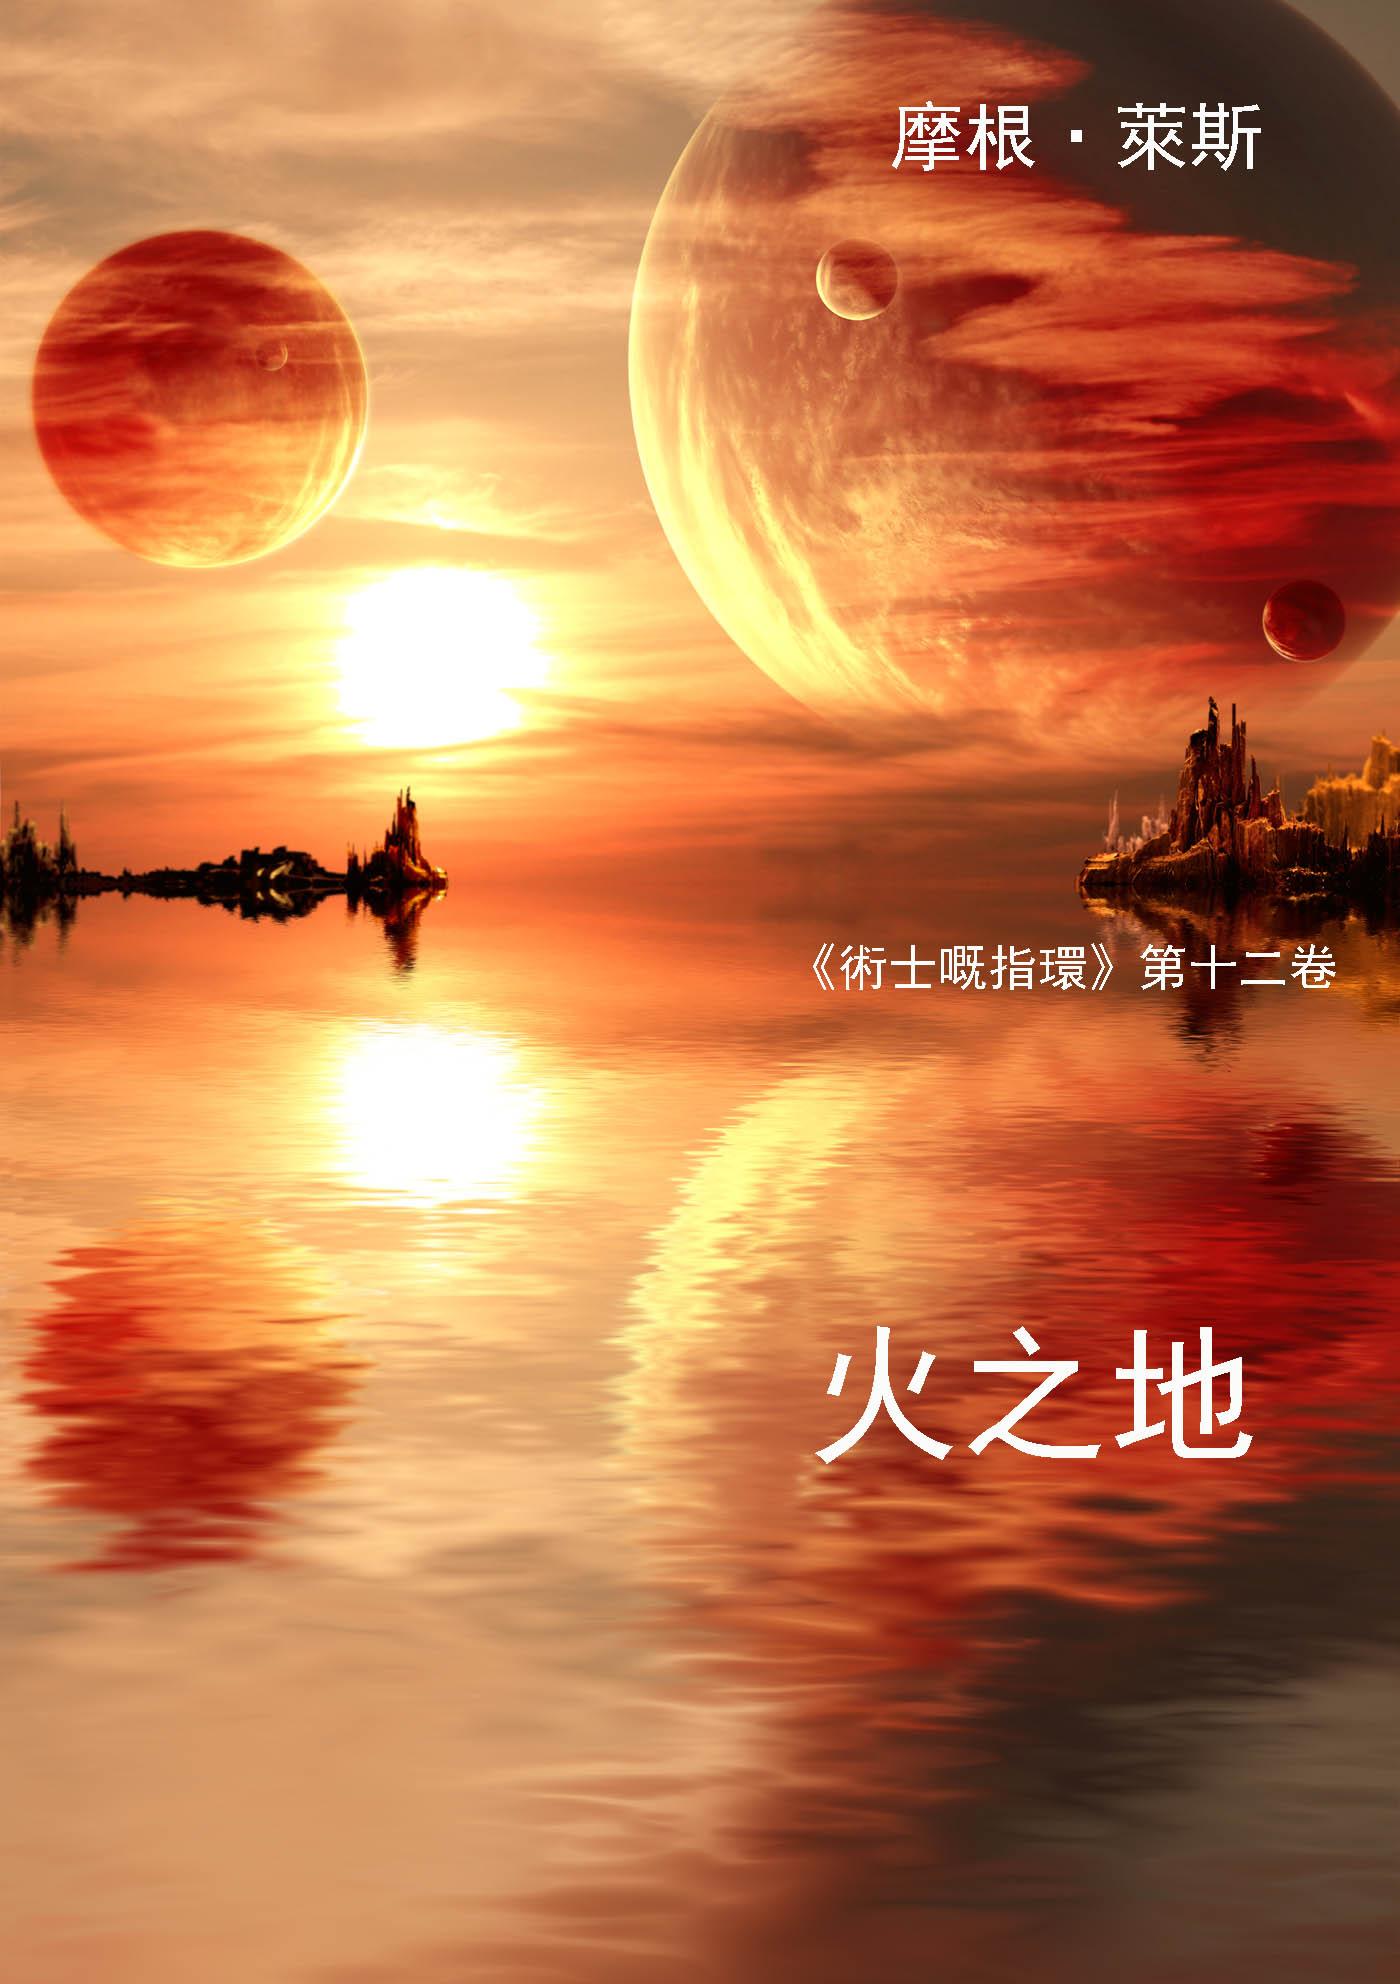 Морган Райс 火之地 北京旅游指南